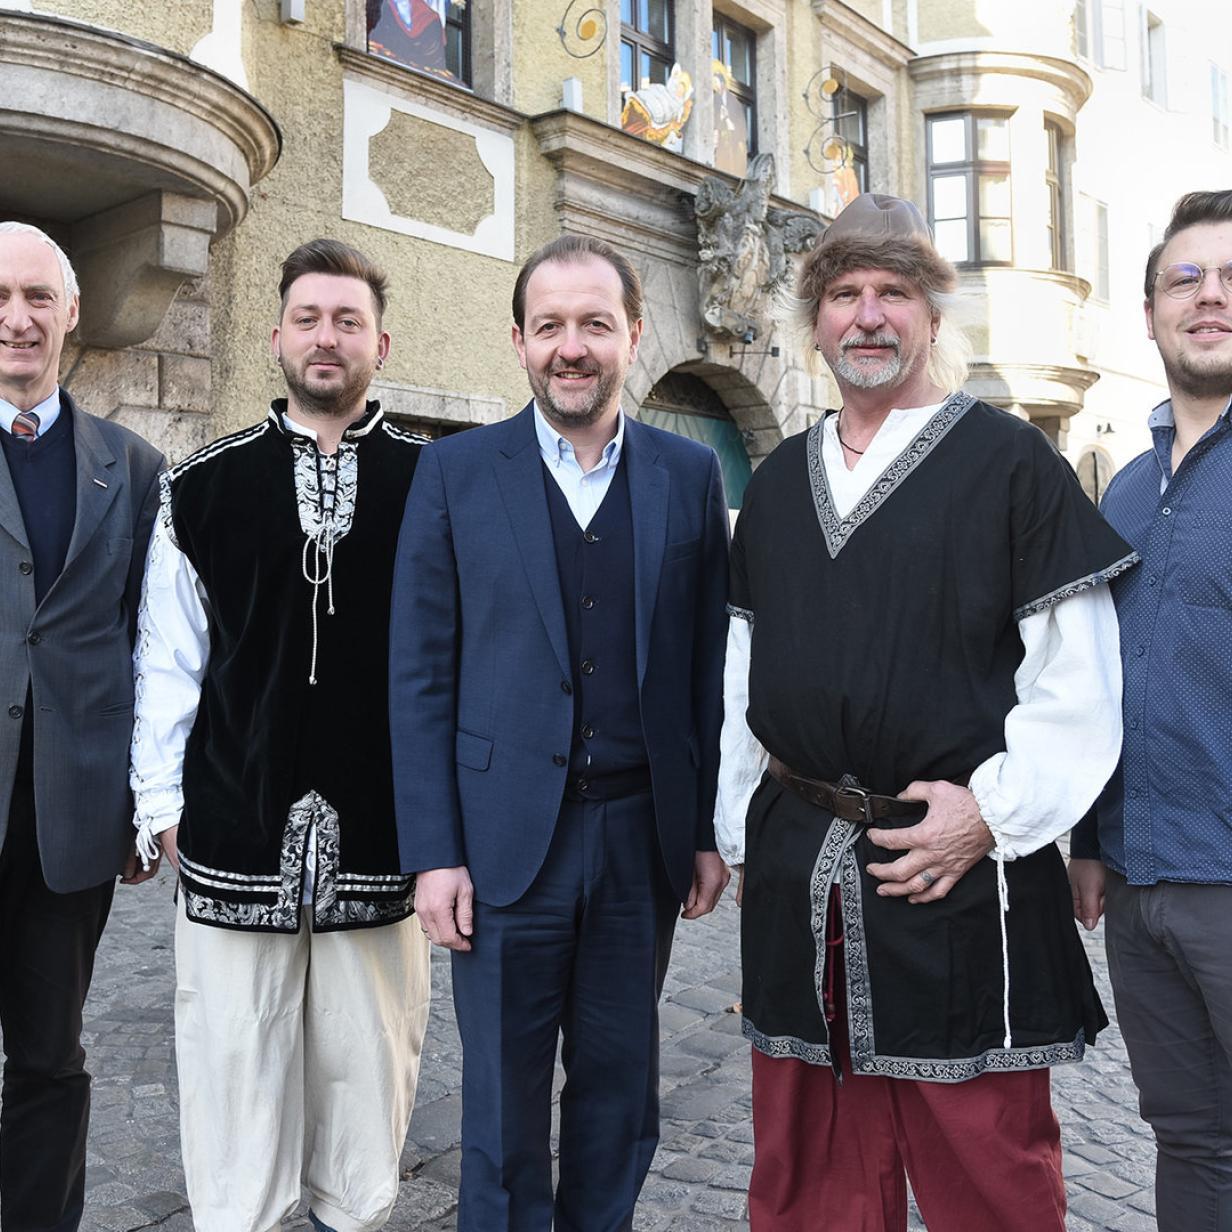 Linz: Waffenverbot gilt auch für Ritter